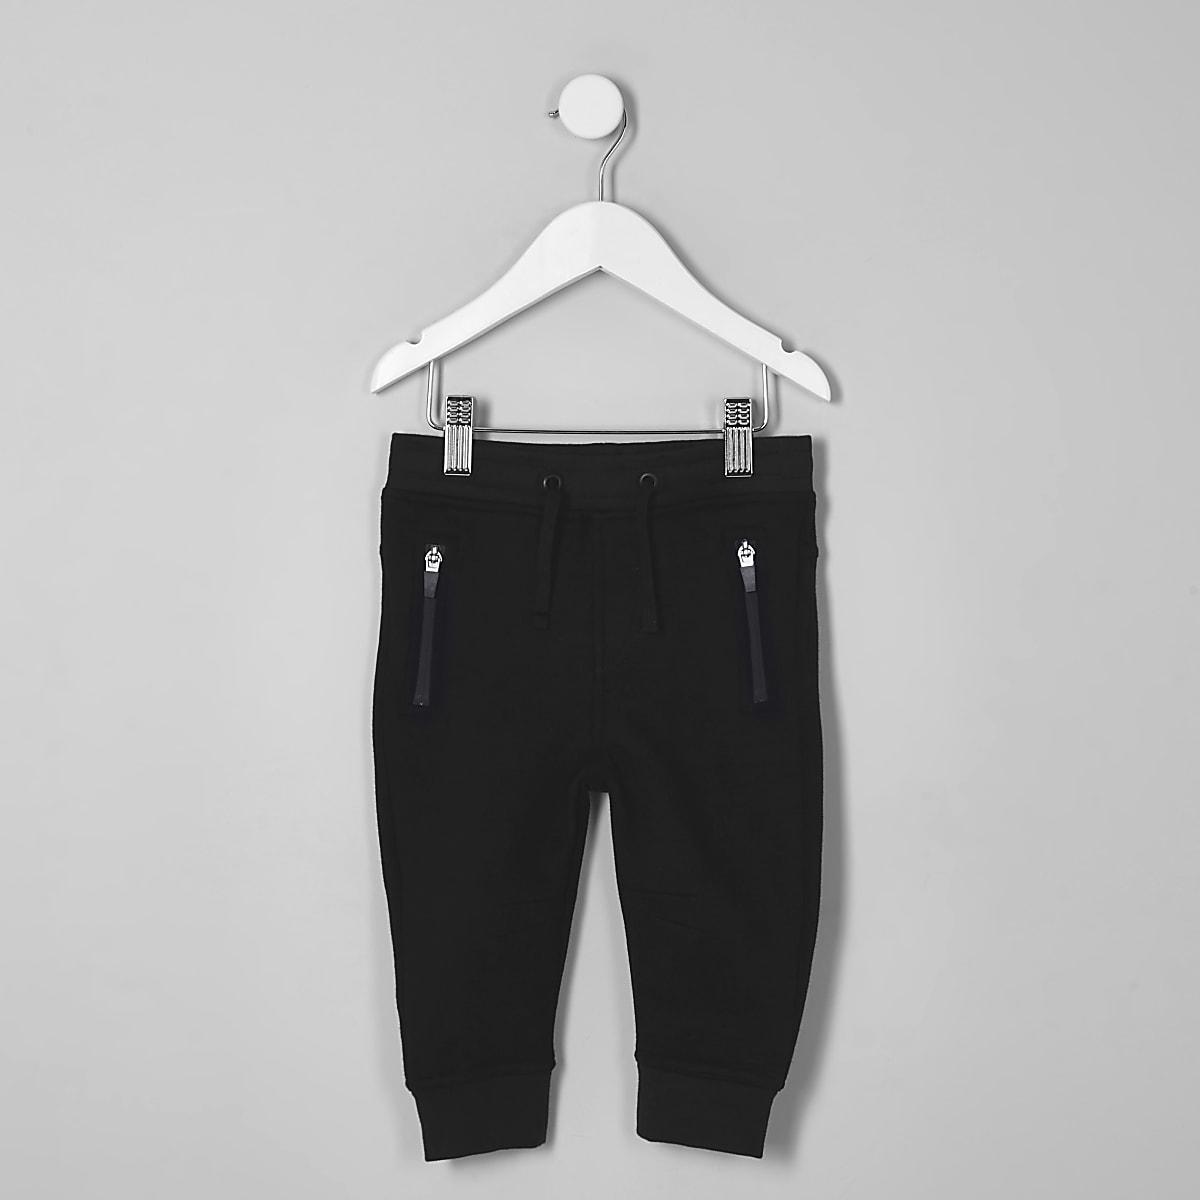 Pantalon de survêtement bleu marine à poche zippée mini garçon